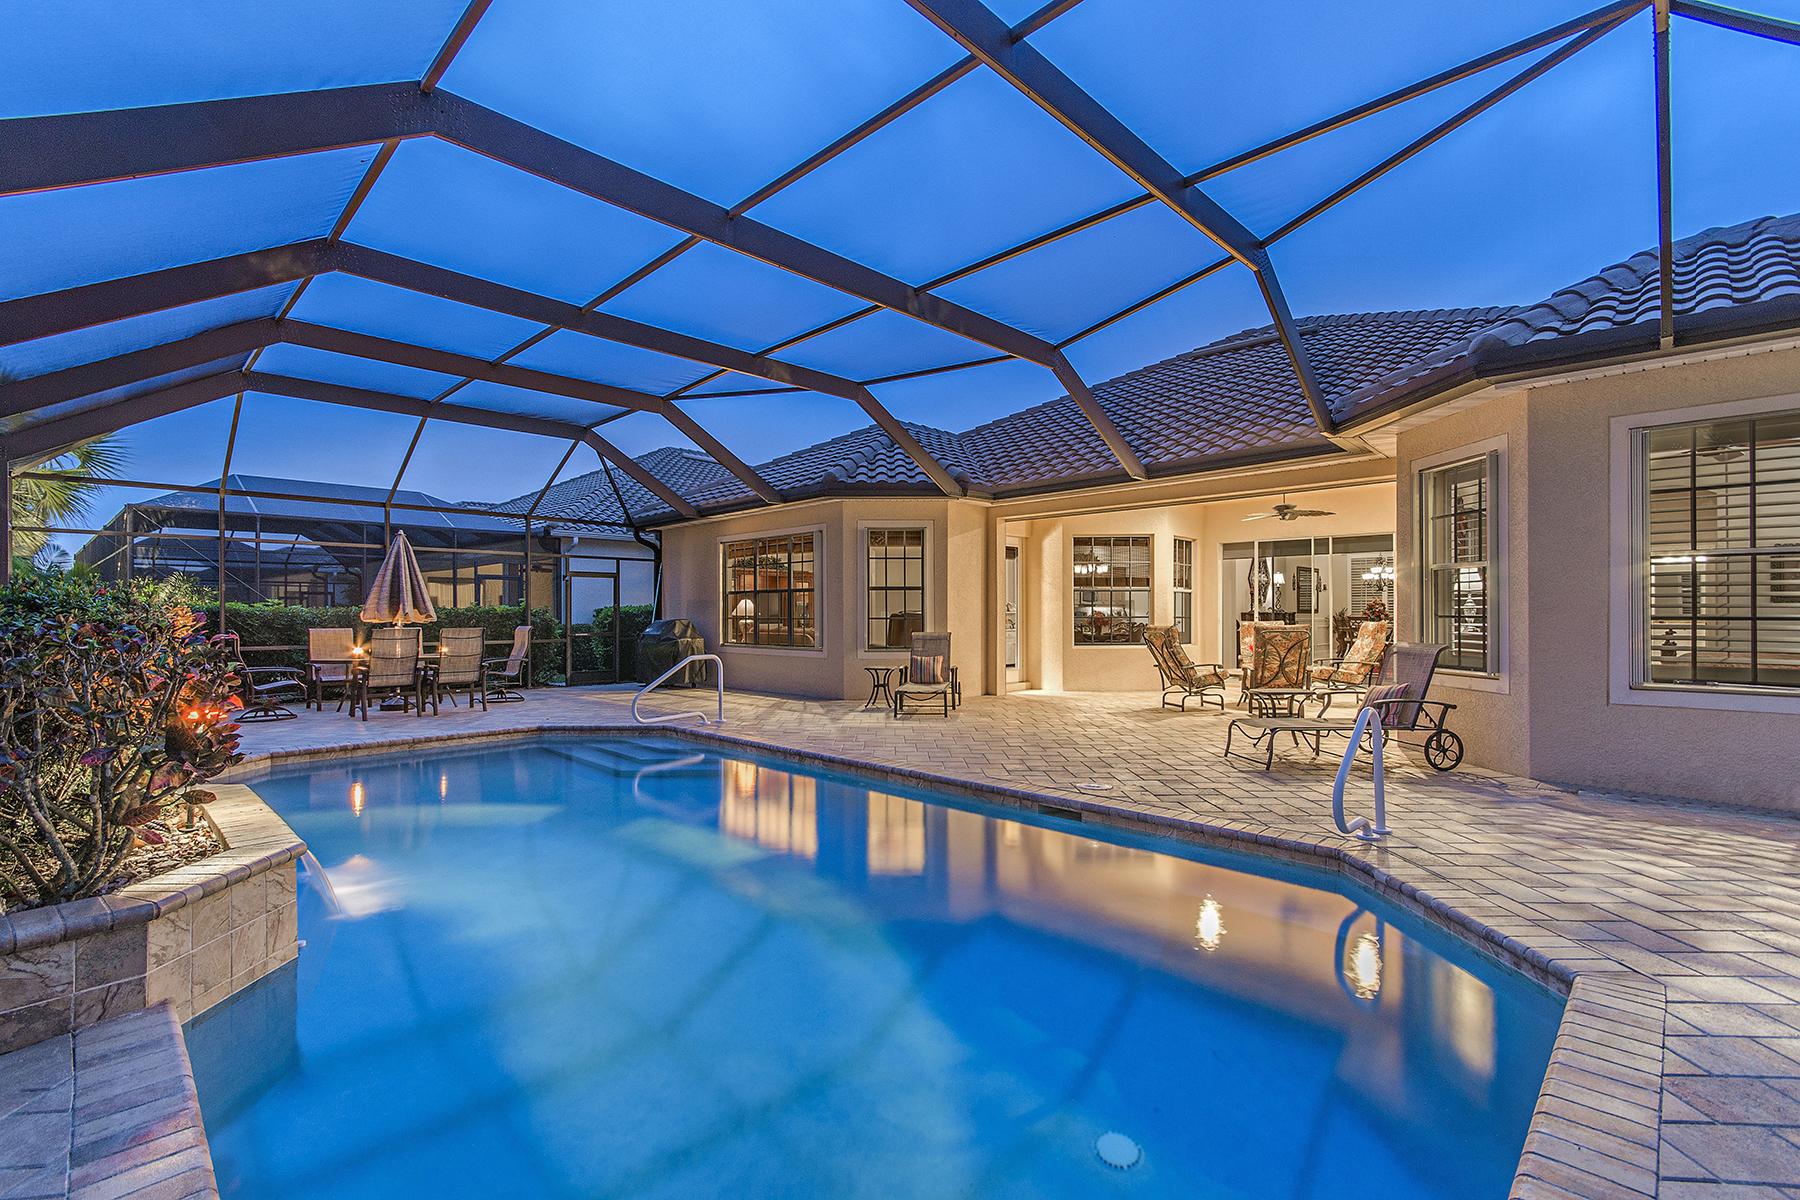 獨棟家庭住宅 為 出售 在 Twin Eagles 11914 Heather Woods Ct Naples, 佛羅里達州, 34120 美國